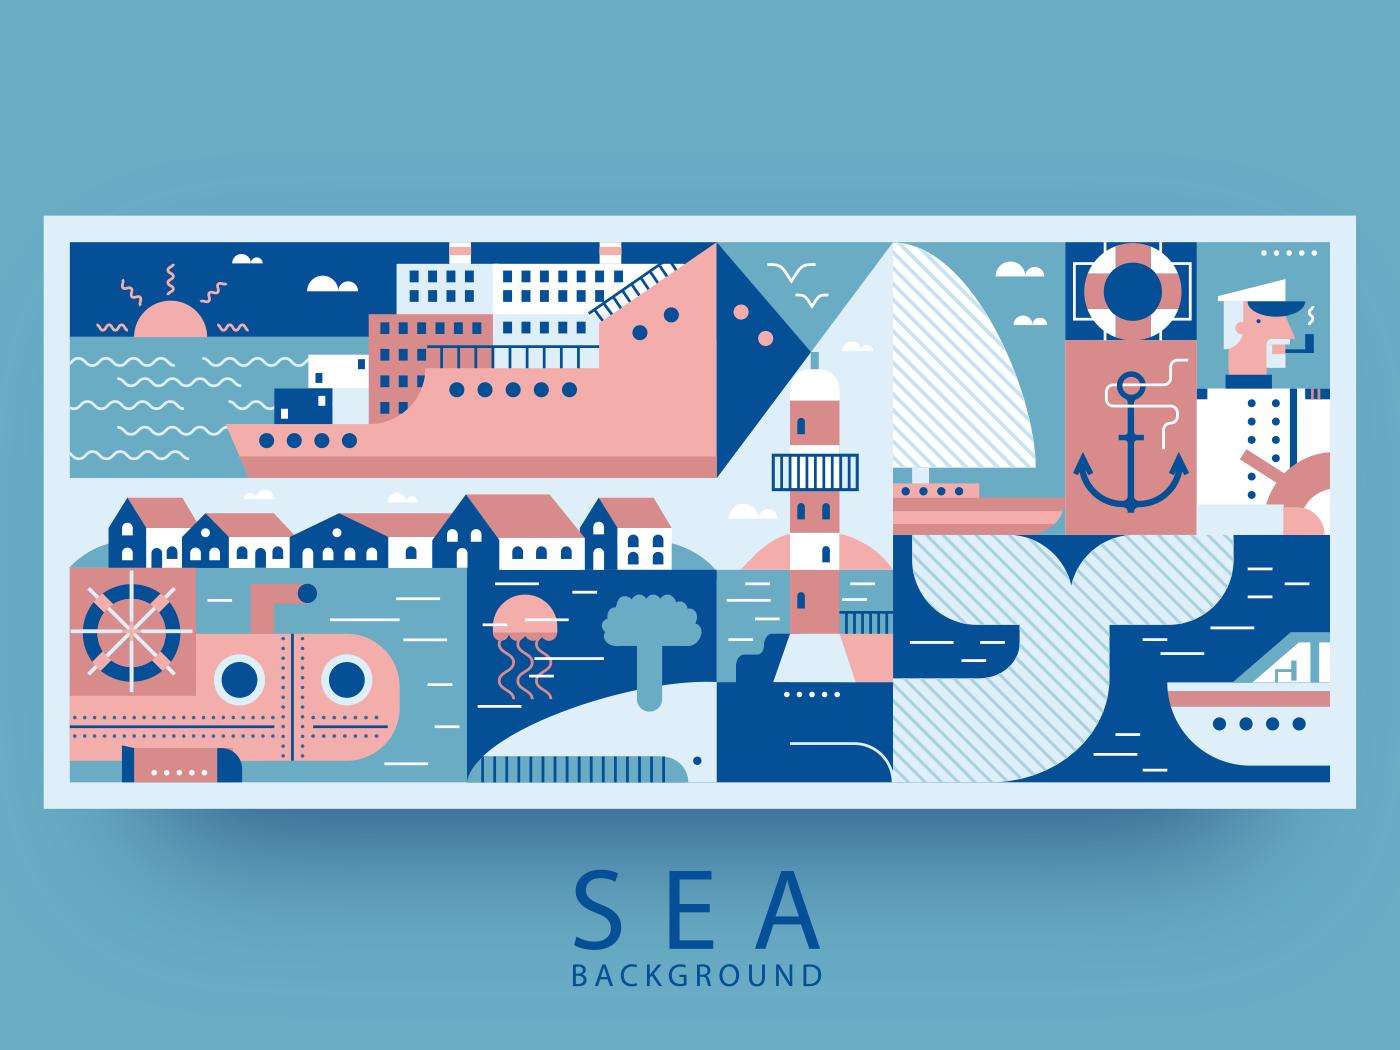 Sea port and city background illustration